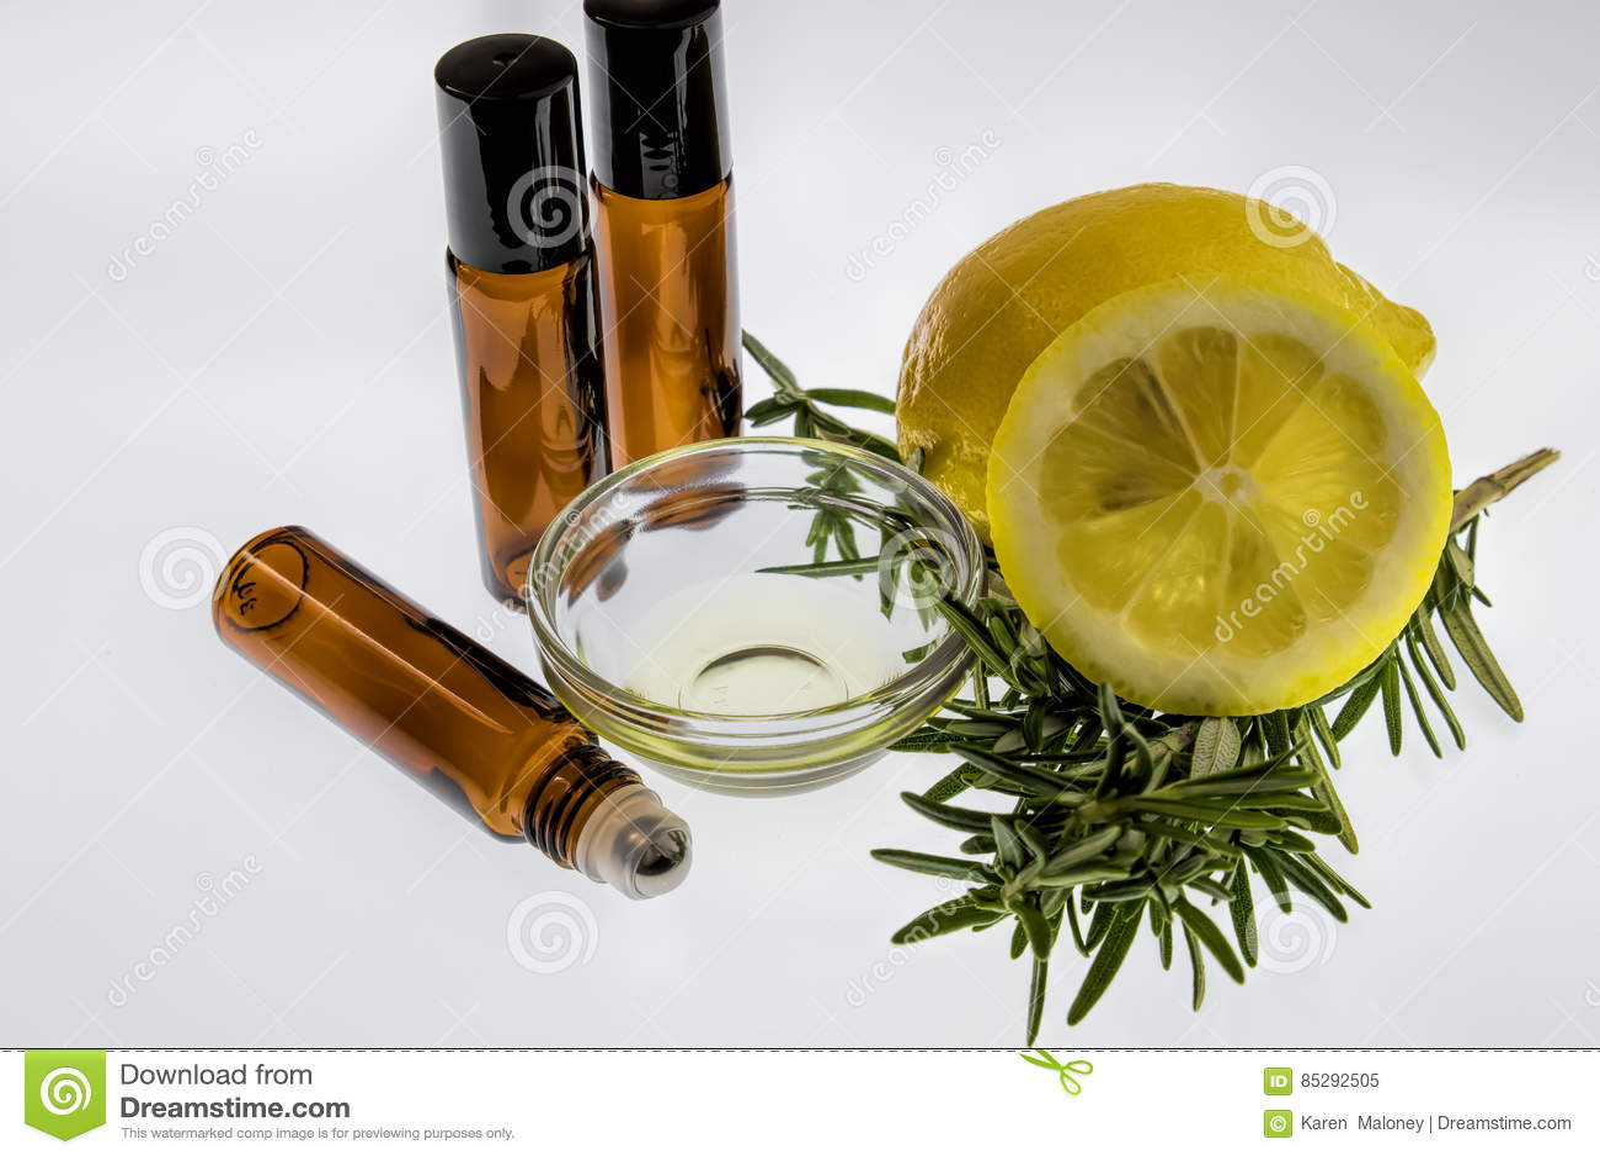 Essential Oils Stock Image Image Of Citrus Glass Fresh 85292505